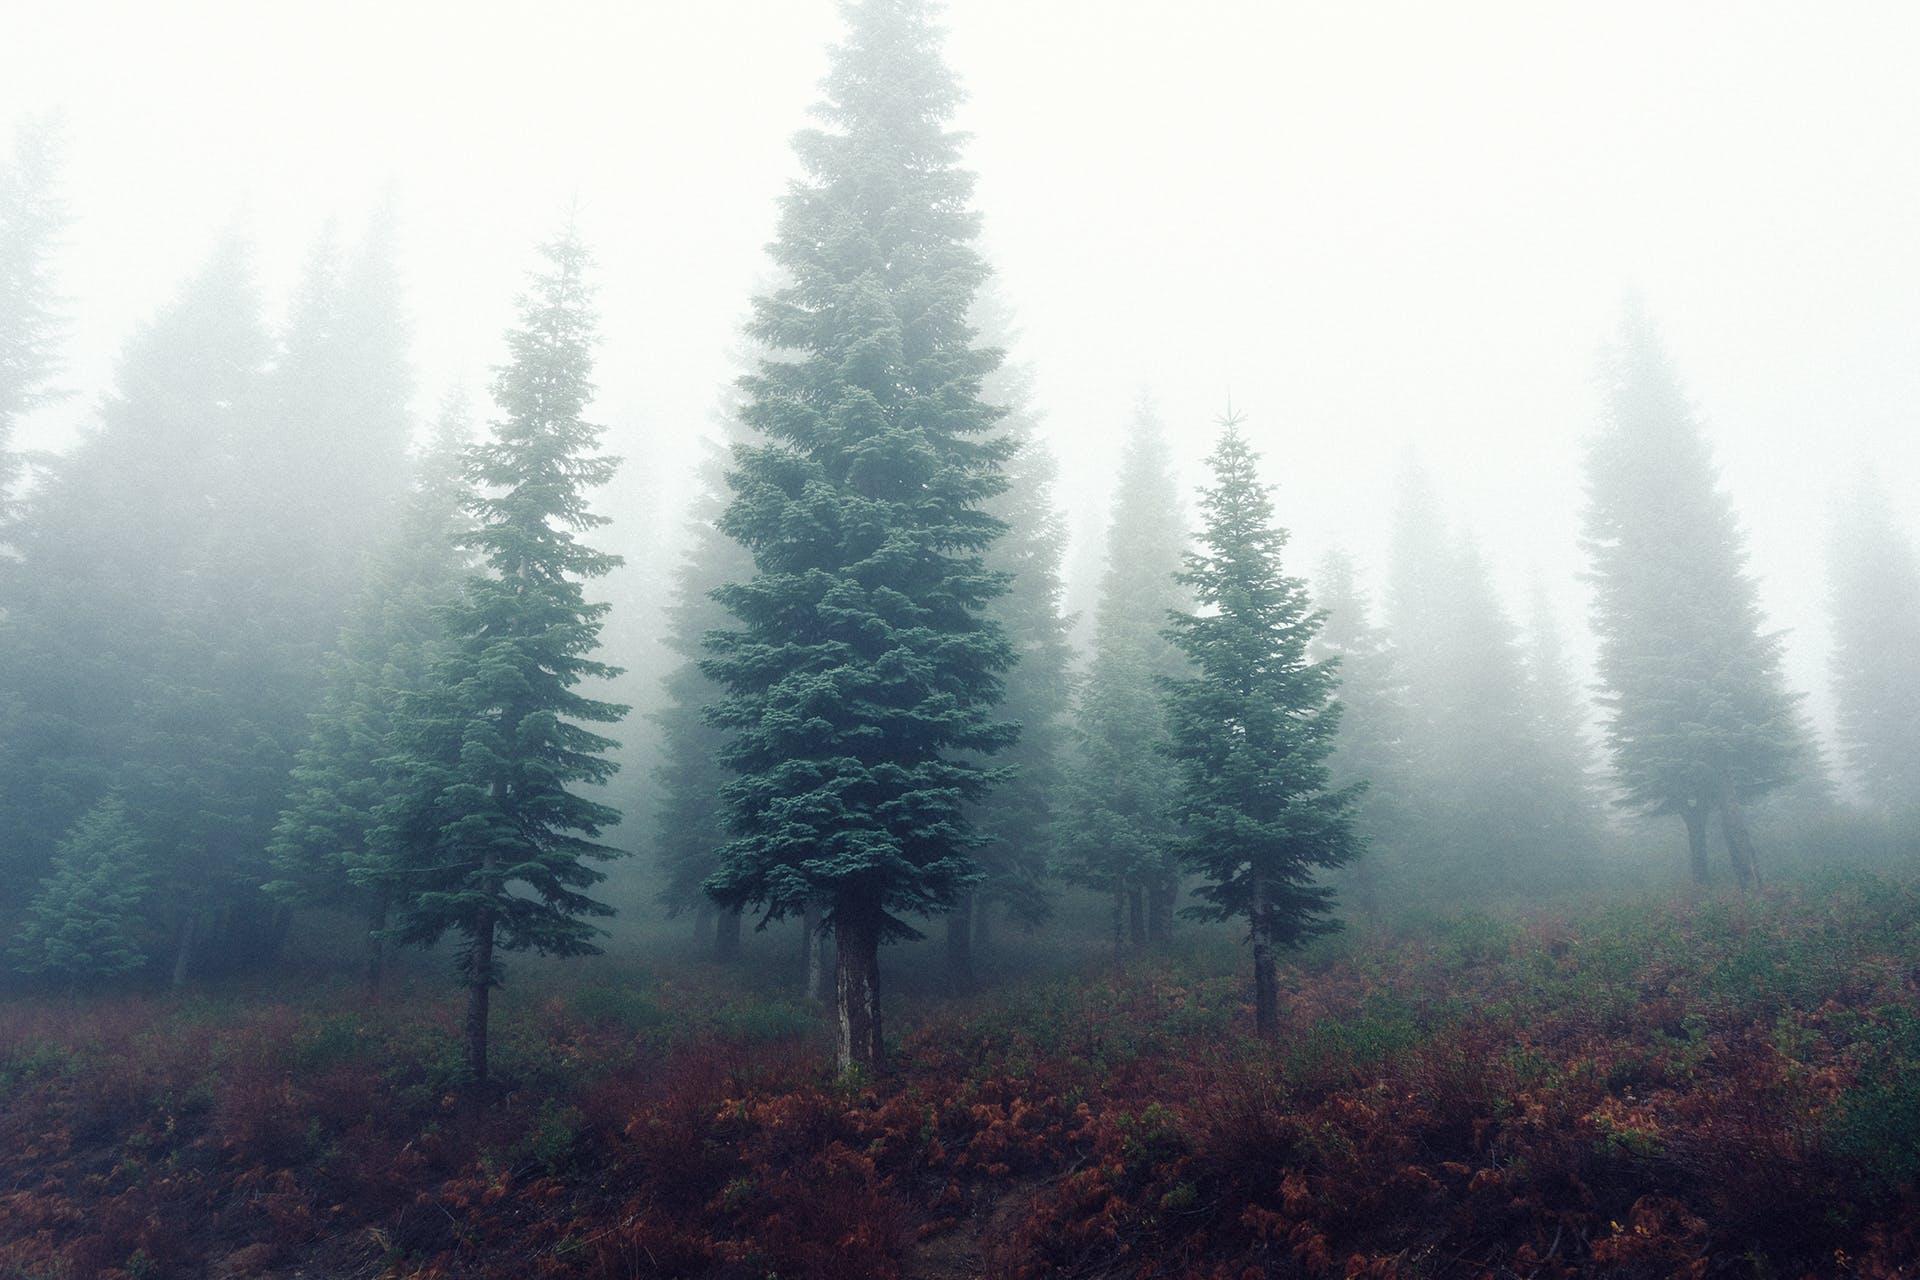 Kostenloses Stock Foto zu bäume, dunstig, nebel, neblig